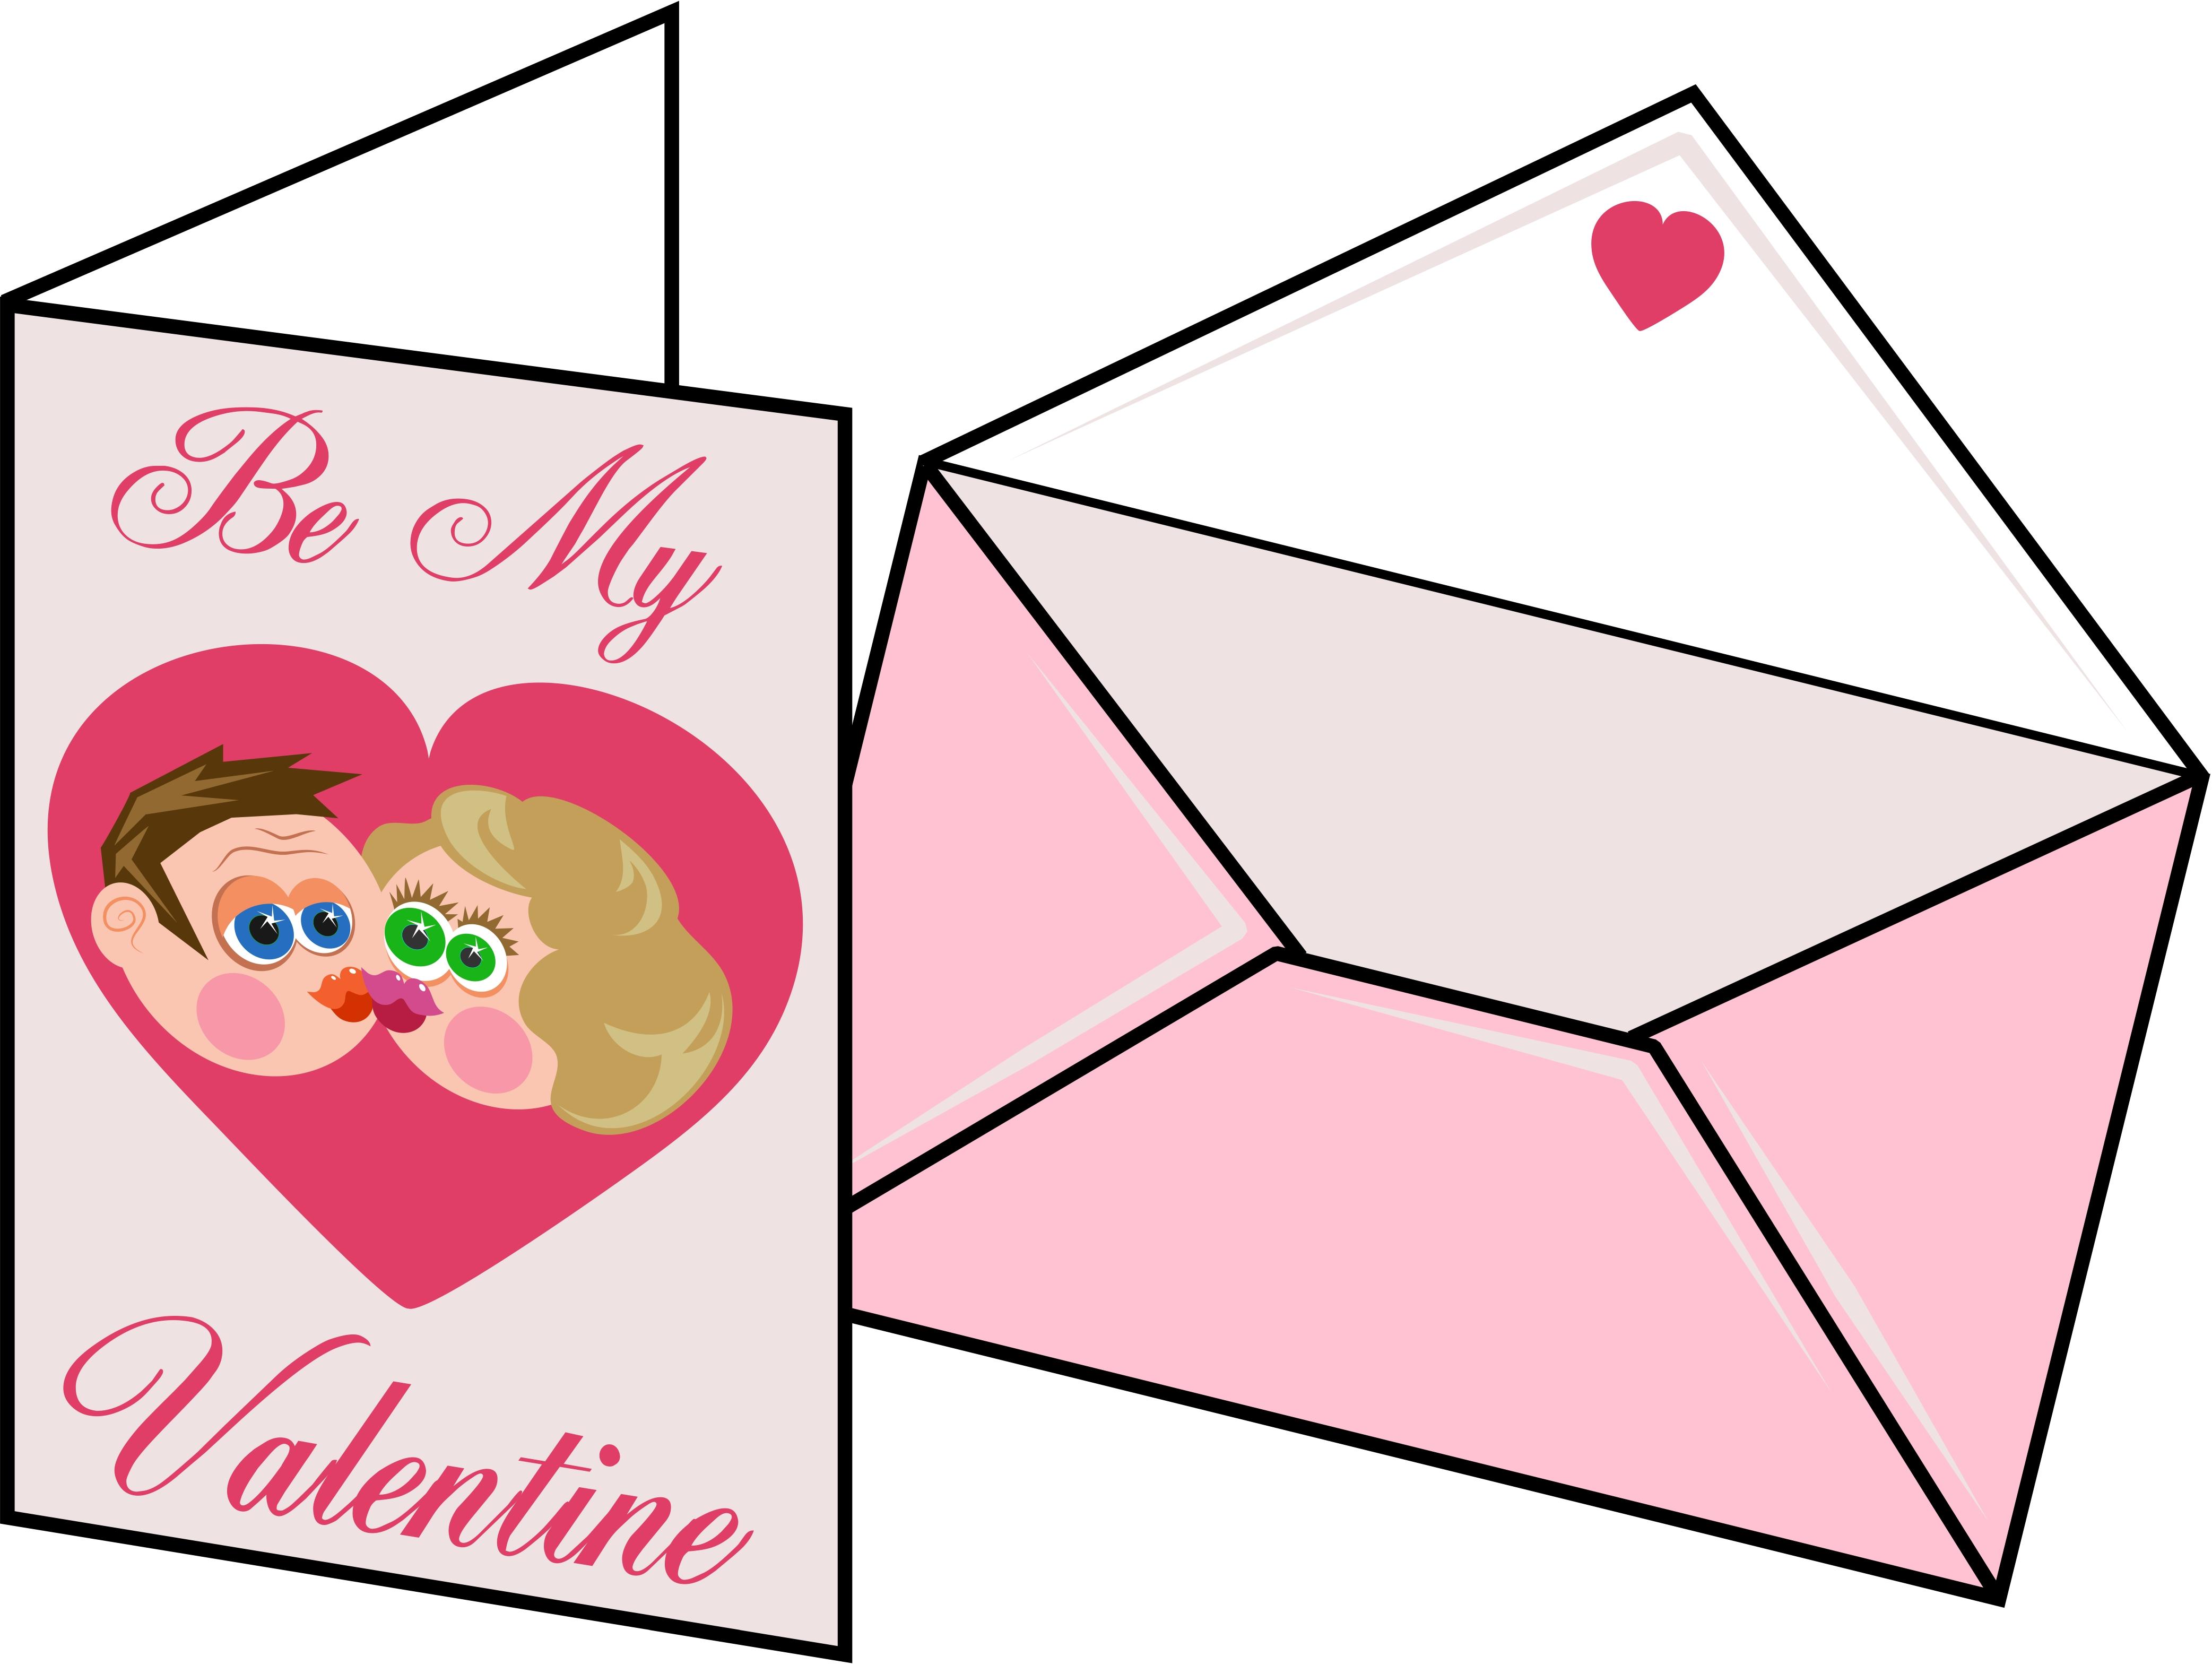 4169x3138 Stunning Ideas Valentines Day Cards Clip Art Image Of Valentine